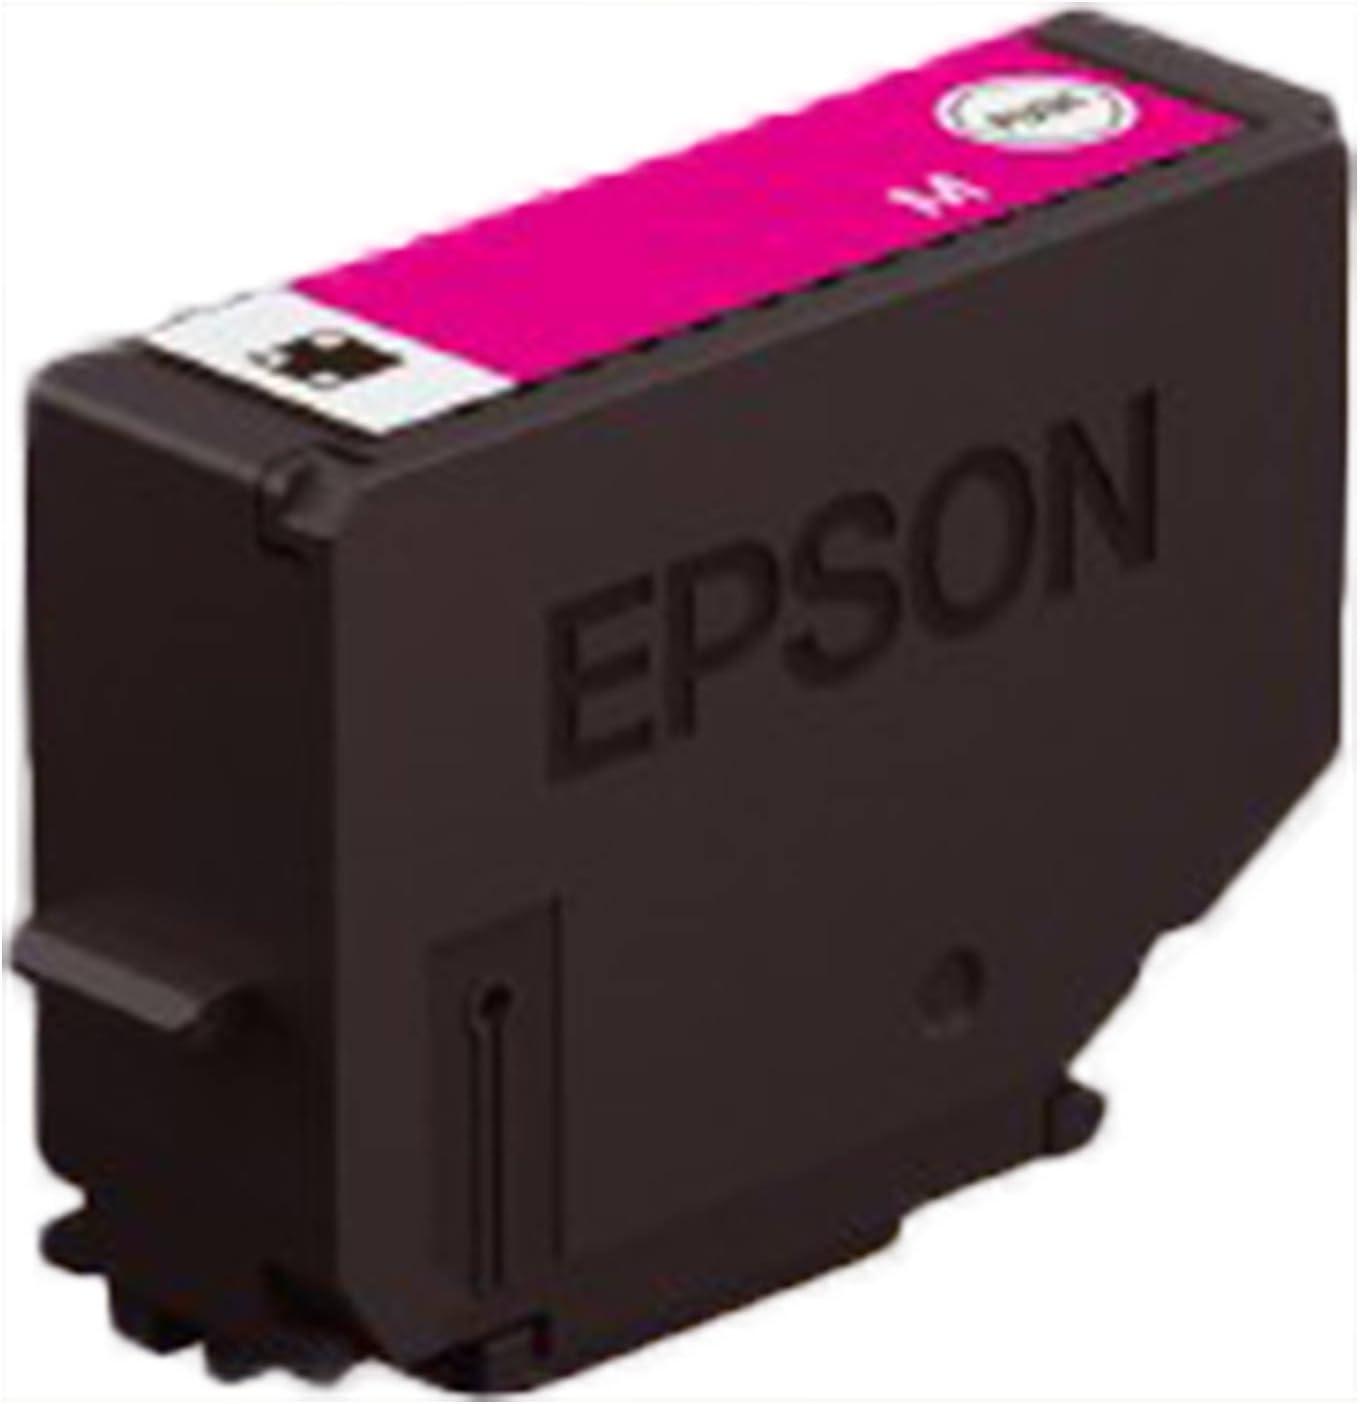 Epson Original 378xl Tinte Eichhörnchen Xp 8500 Xp 8600 Xp 8605 Xp 15000 Amazon Dash Replenishment Fähig Magenta Bürobedarf Schreibwaren